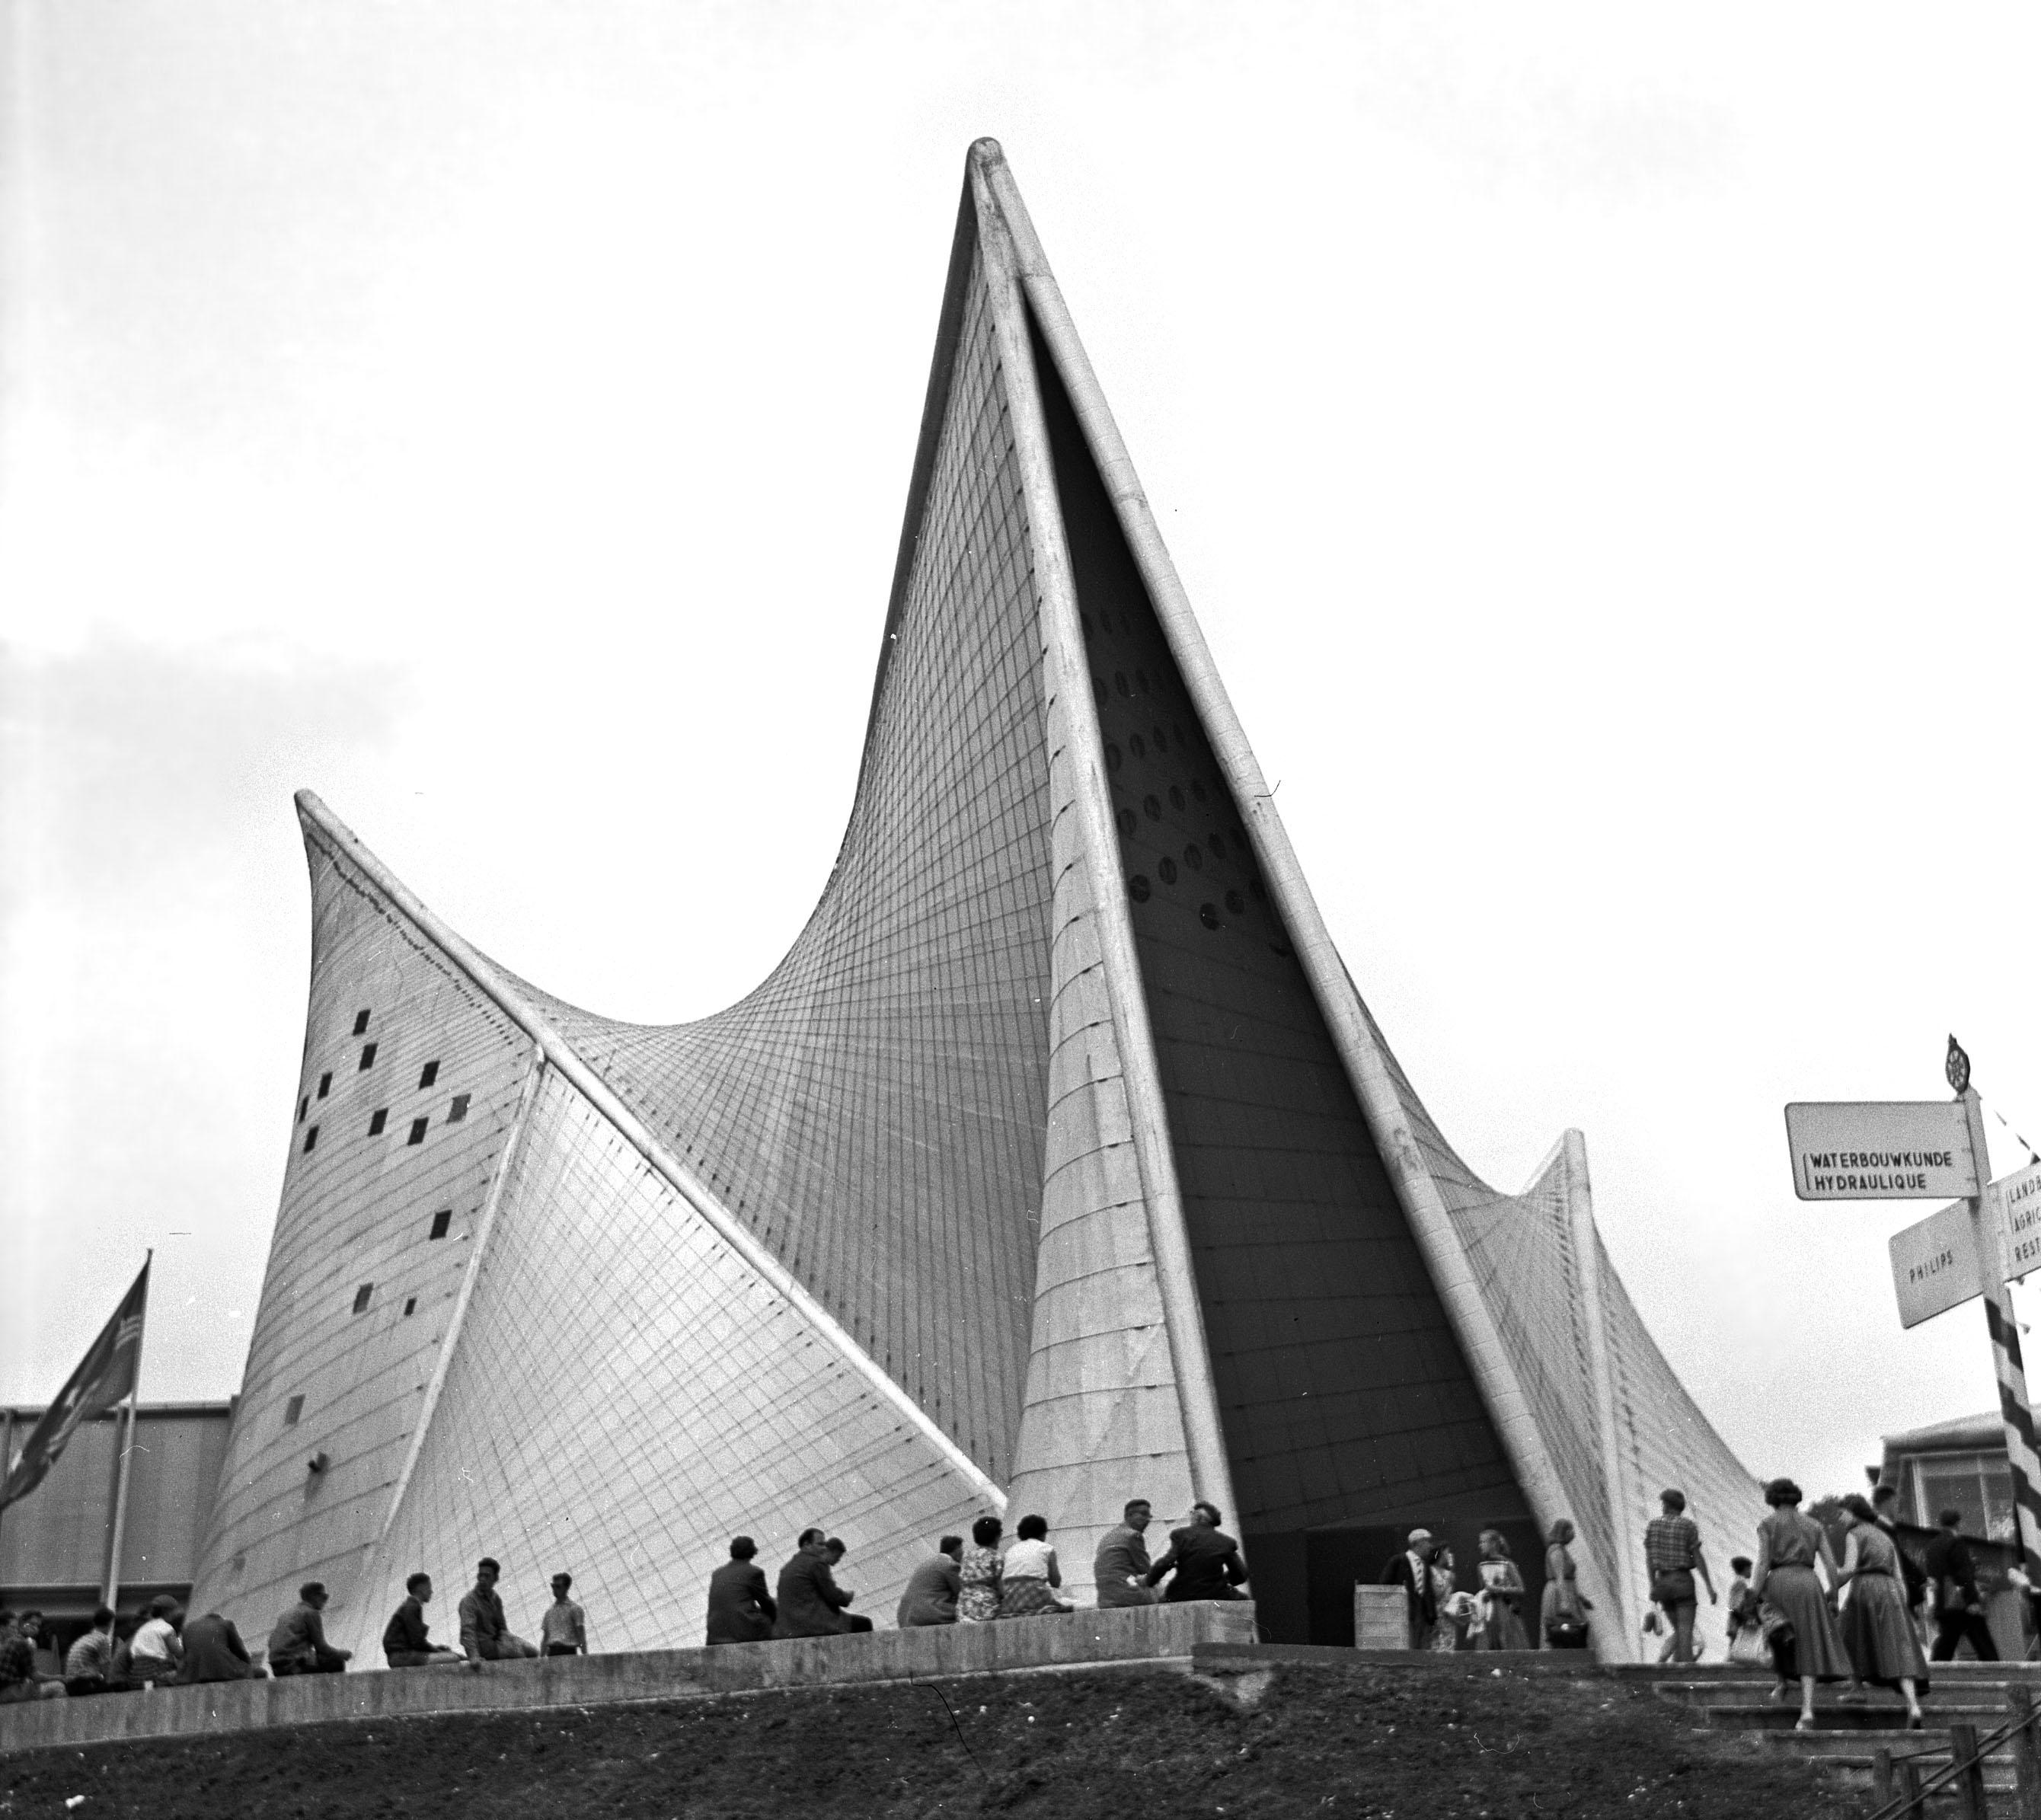 Expo 1958 paviljoen van Philips موسیقی و معماری؛ مواجهه با مرزهای میان فضا و صدا,یانیس زناکیس,اشتوکهاوزن موسیقی و معماری؛ مواجهه با مرزهای میان فضا و صدا 06 The Philips Pavilion at the time